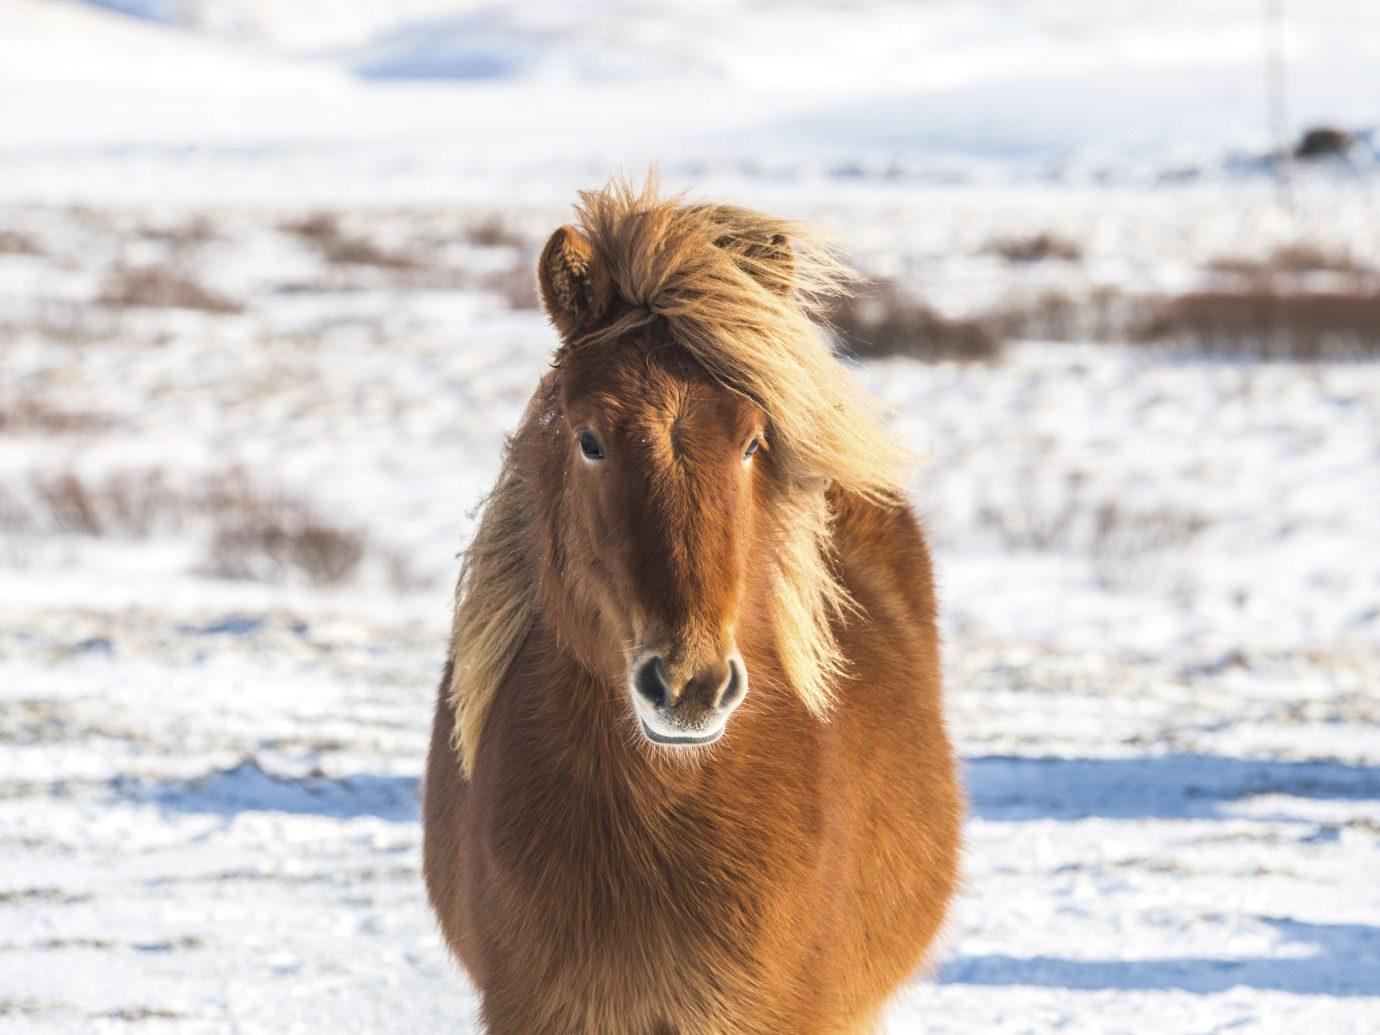 Iceland Trip Ideas outdoor animal mammal ground horse brown vertebrate Beach mane fauna standing Wildlife mustang horse horse like mammal sandy